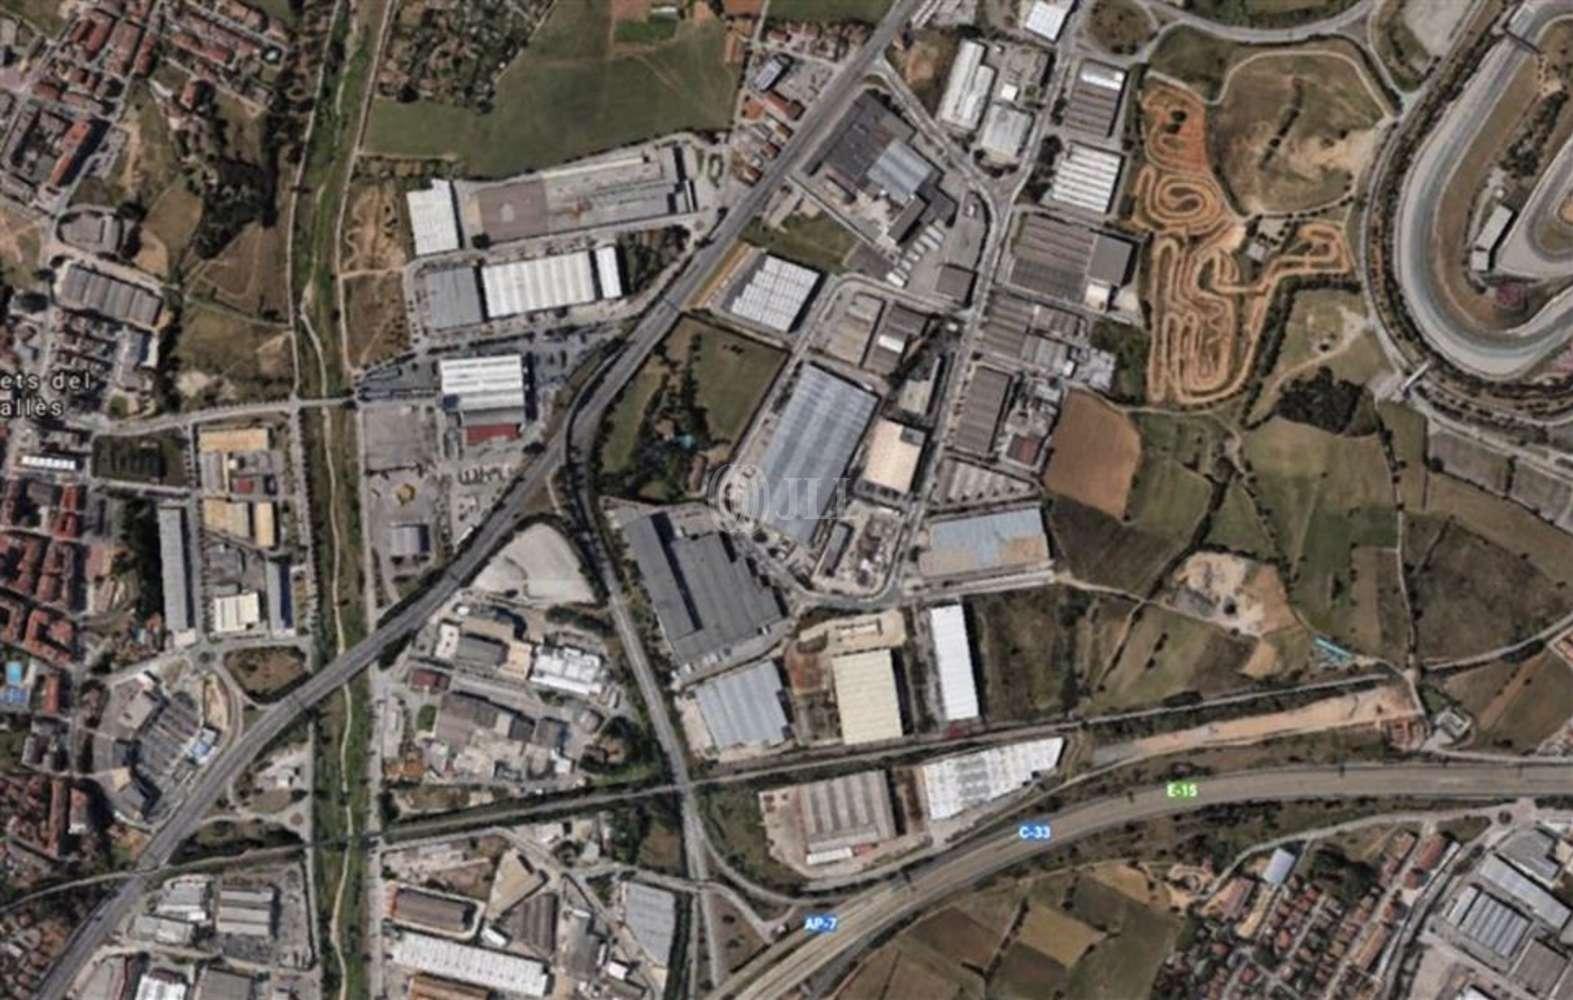 Naves industriales y logísticas Parets del vallès, 08150 - Nave Logistica - B0416 CAN VOLART - 10813